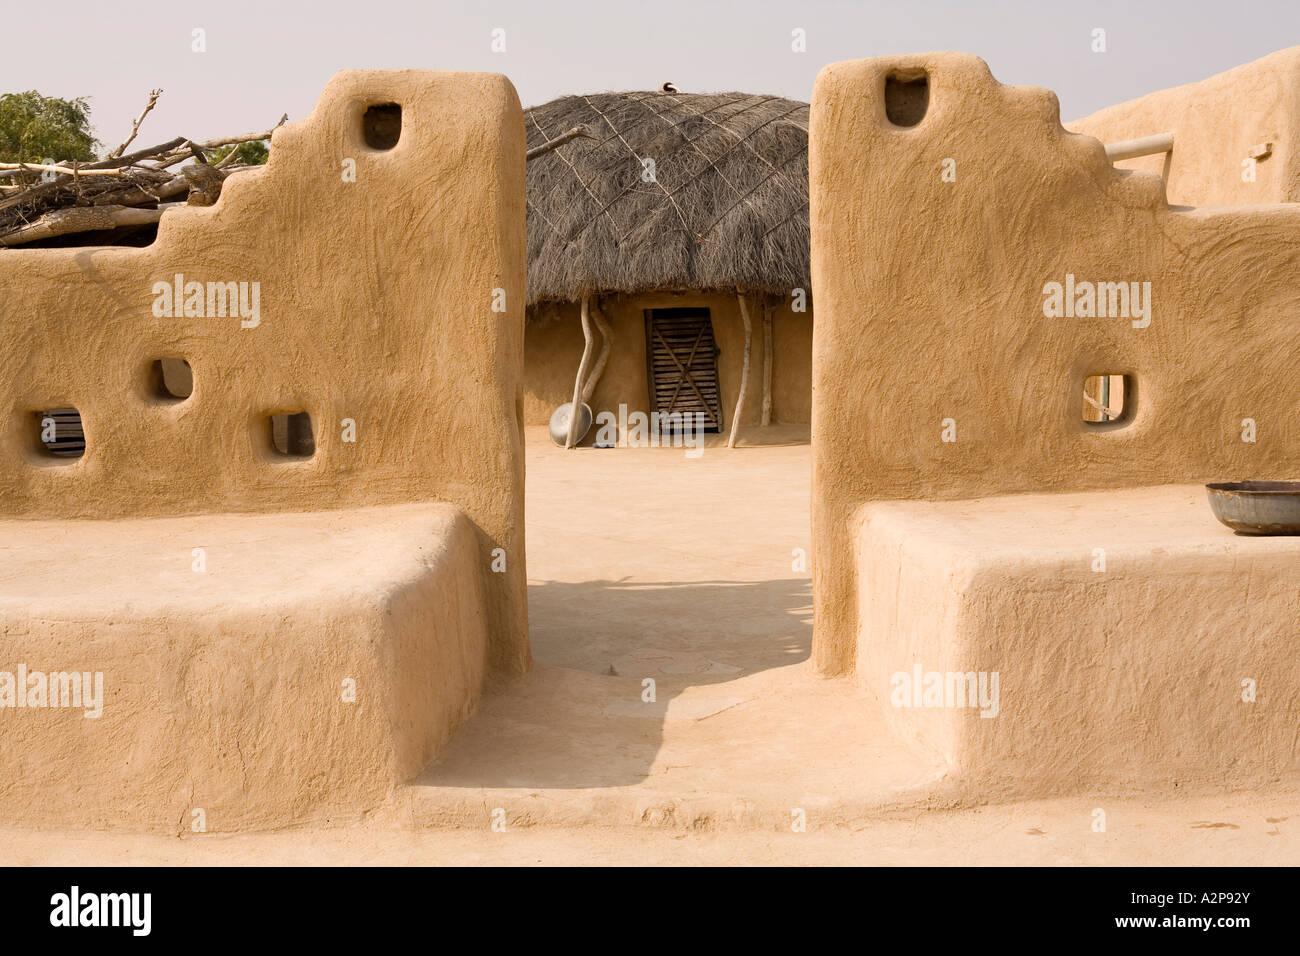 india rajasthan thar desert village architecture decorated